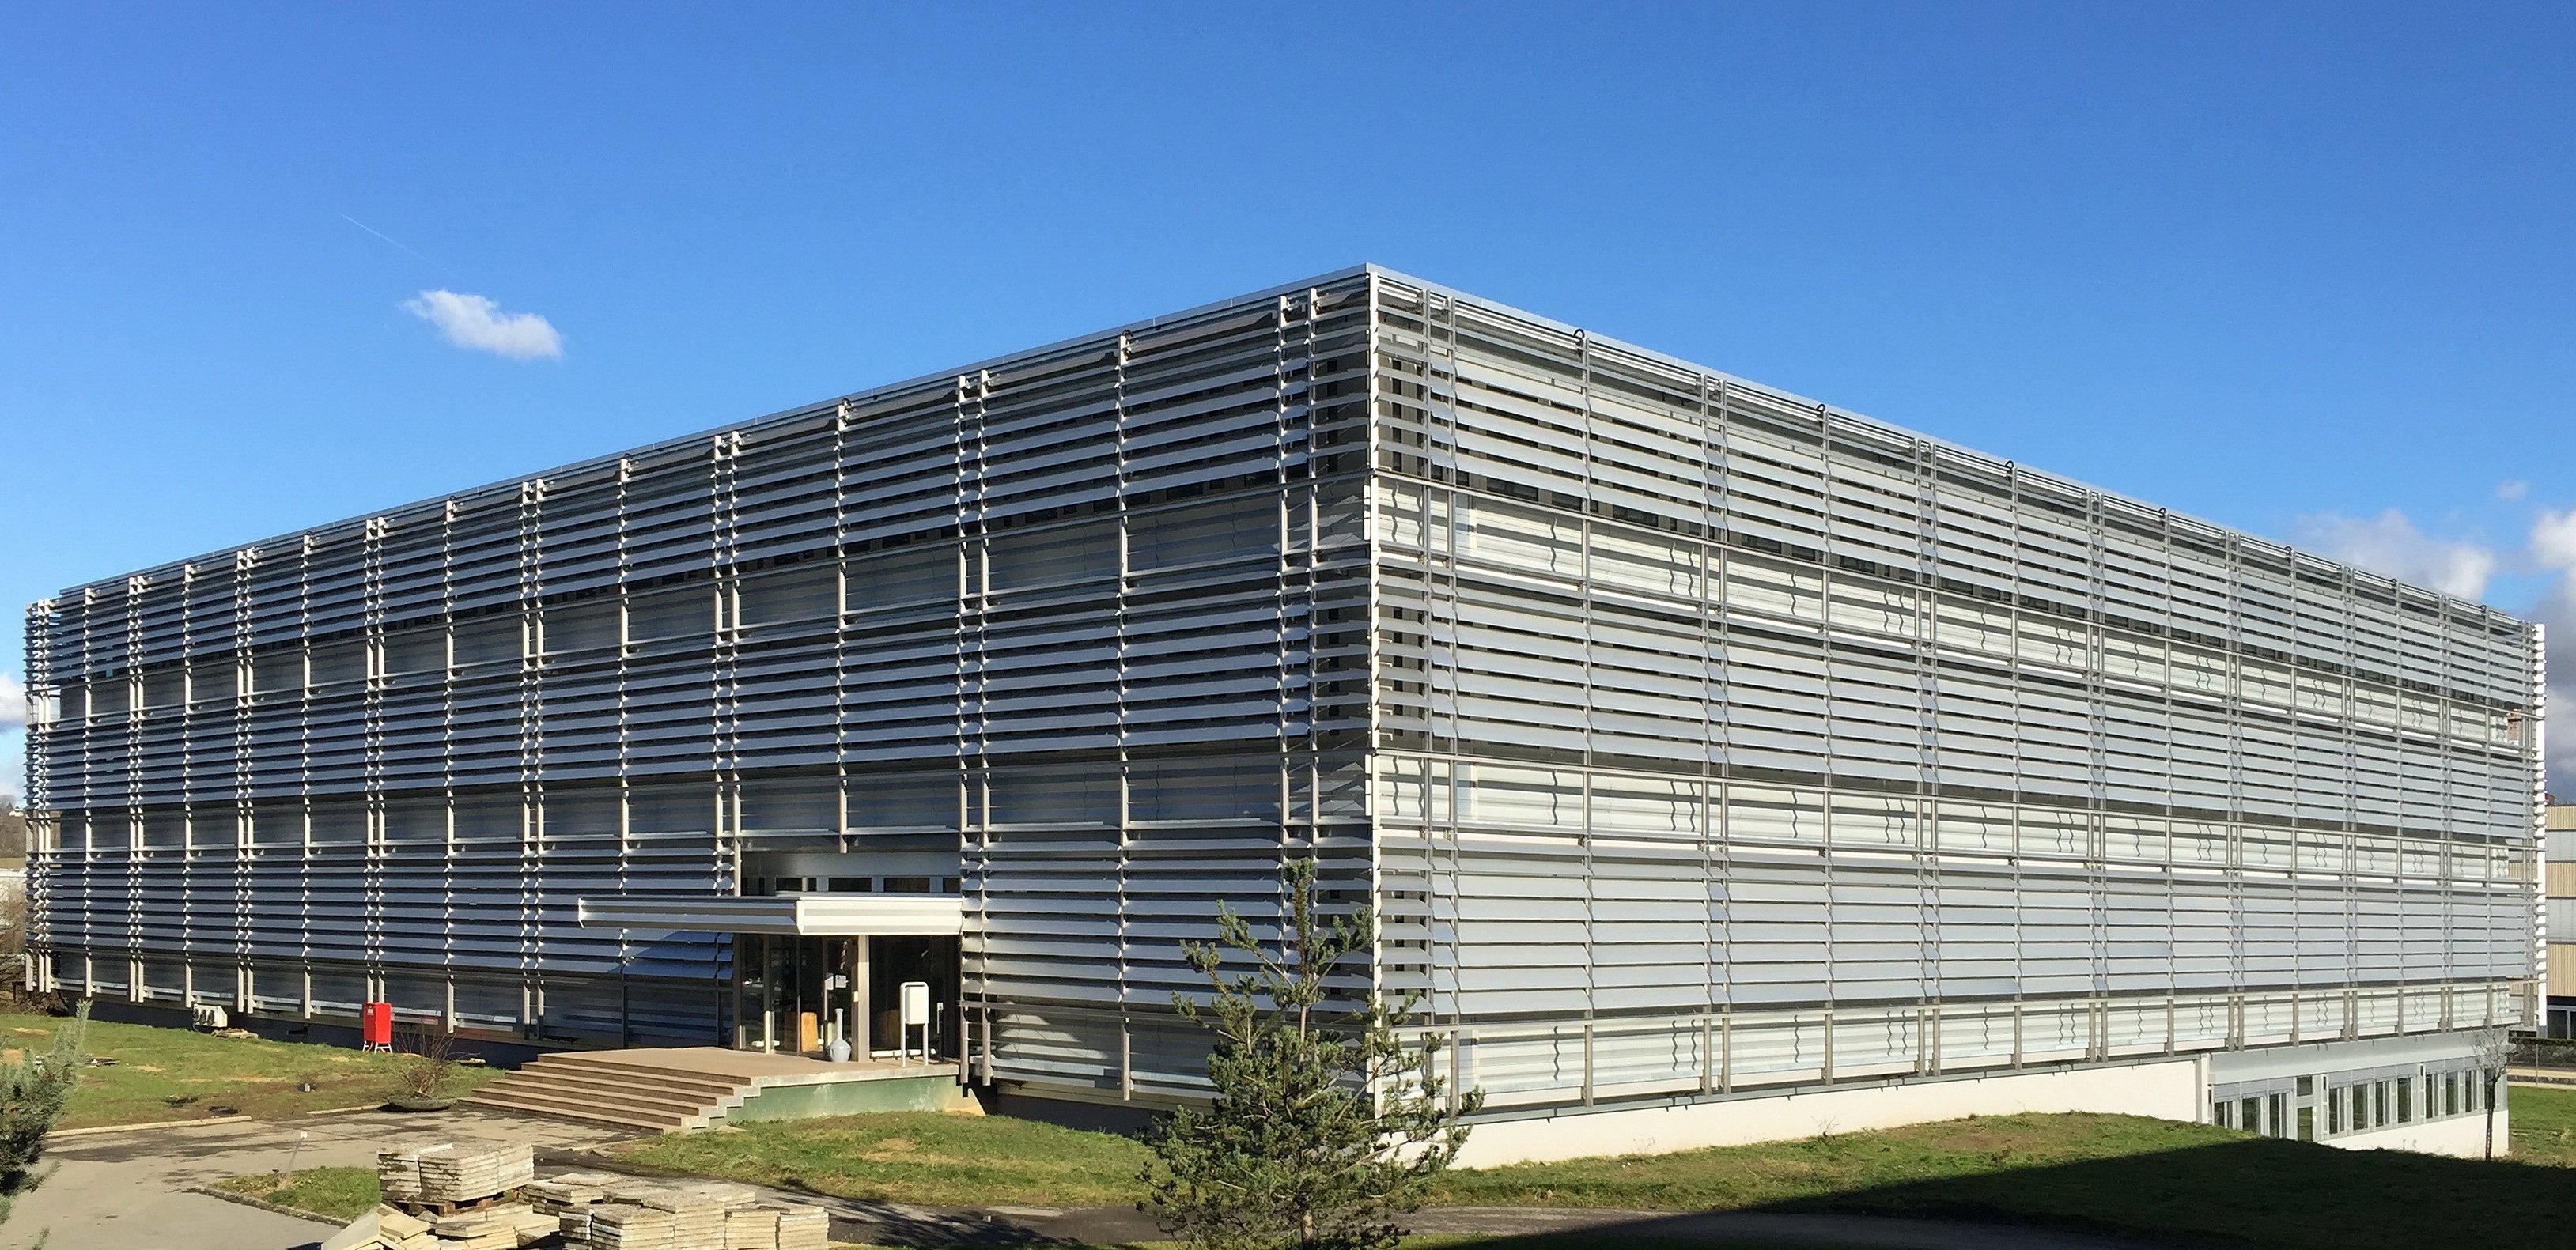 Ensemble architecture et urbanisme SA